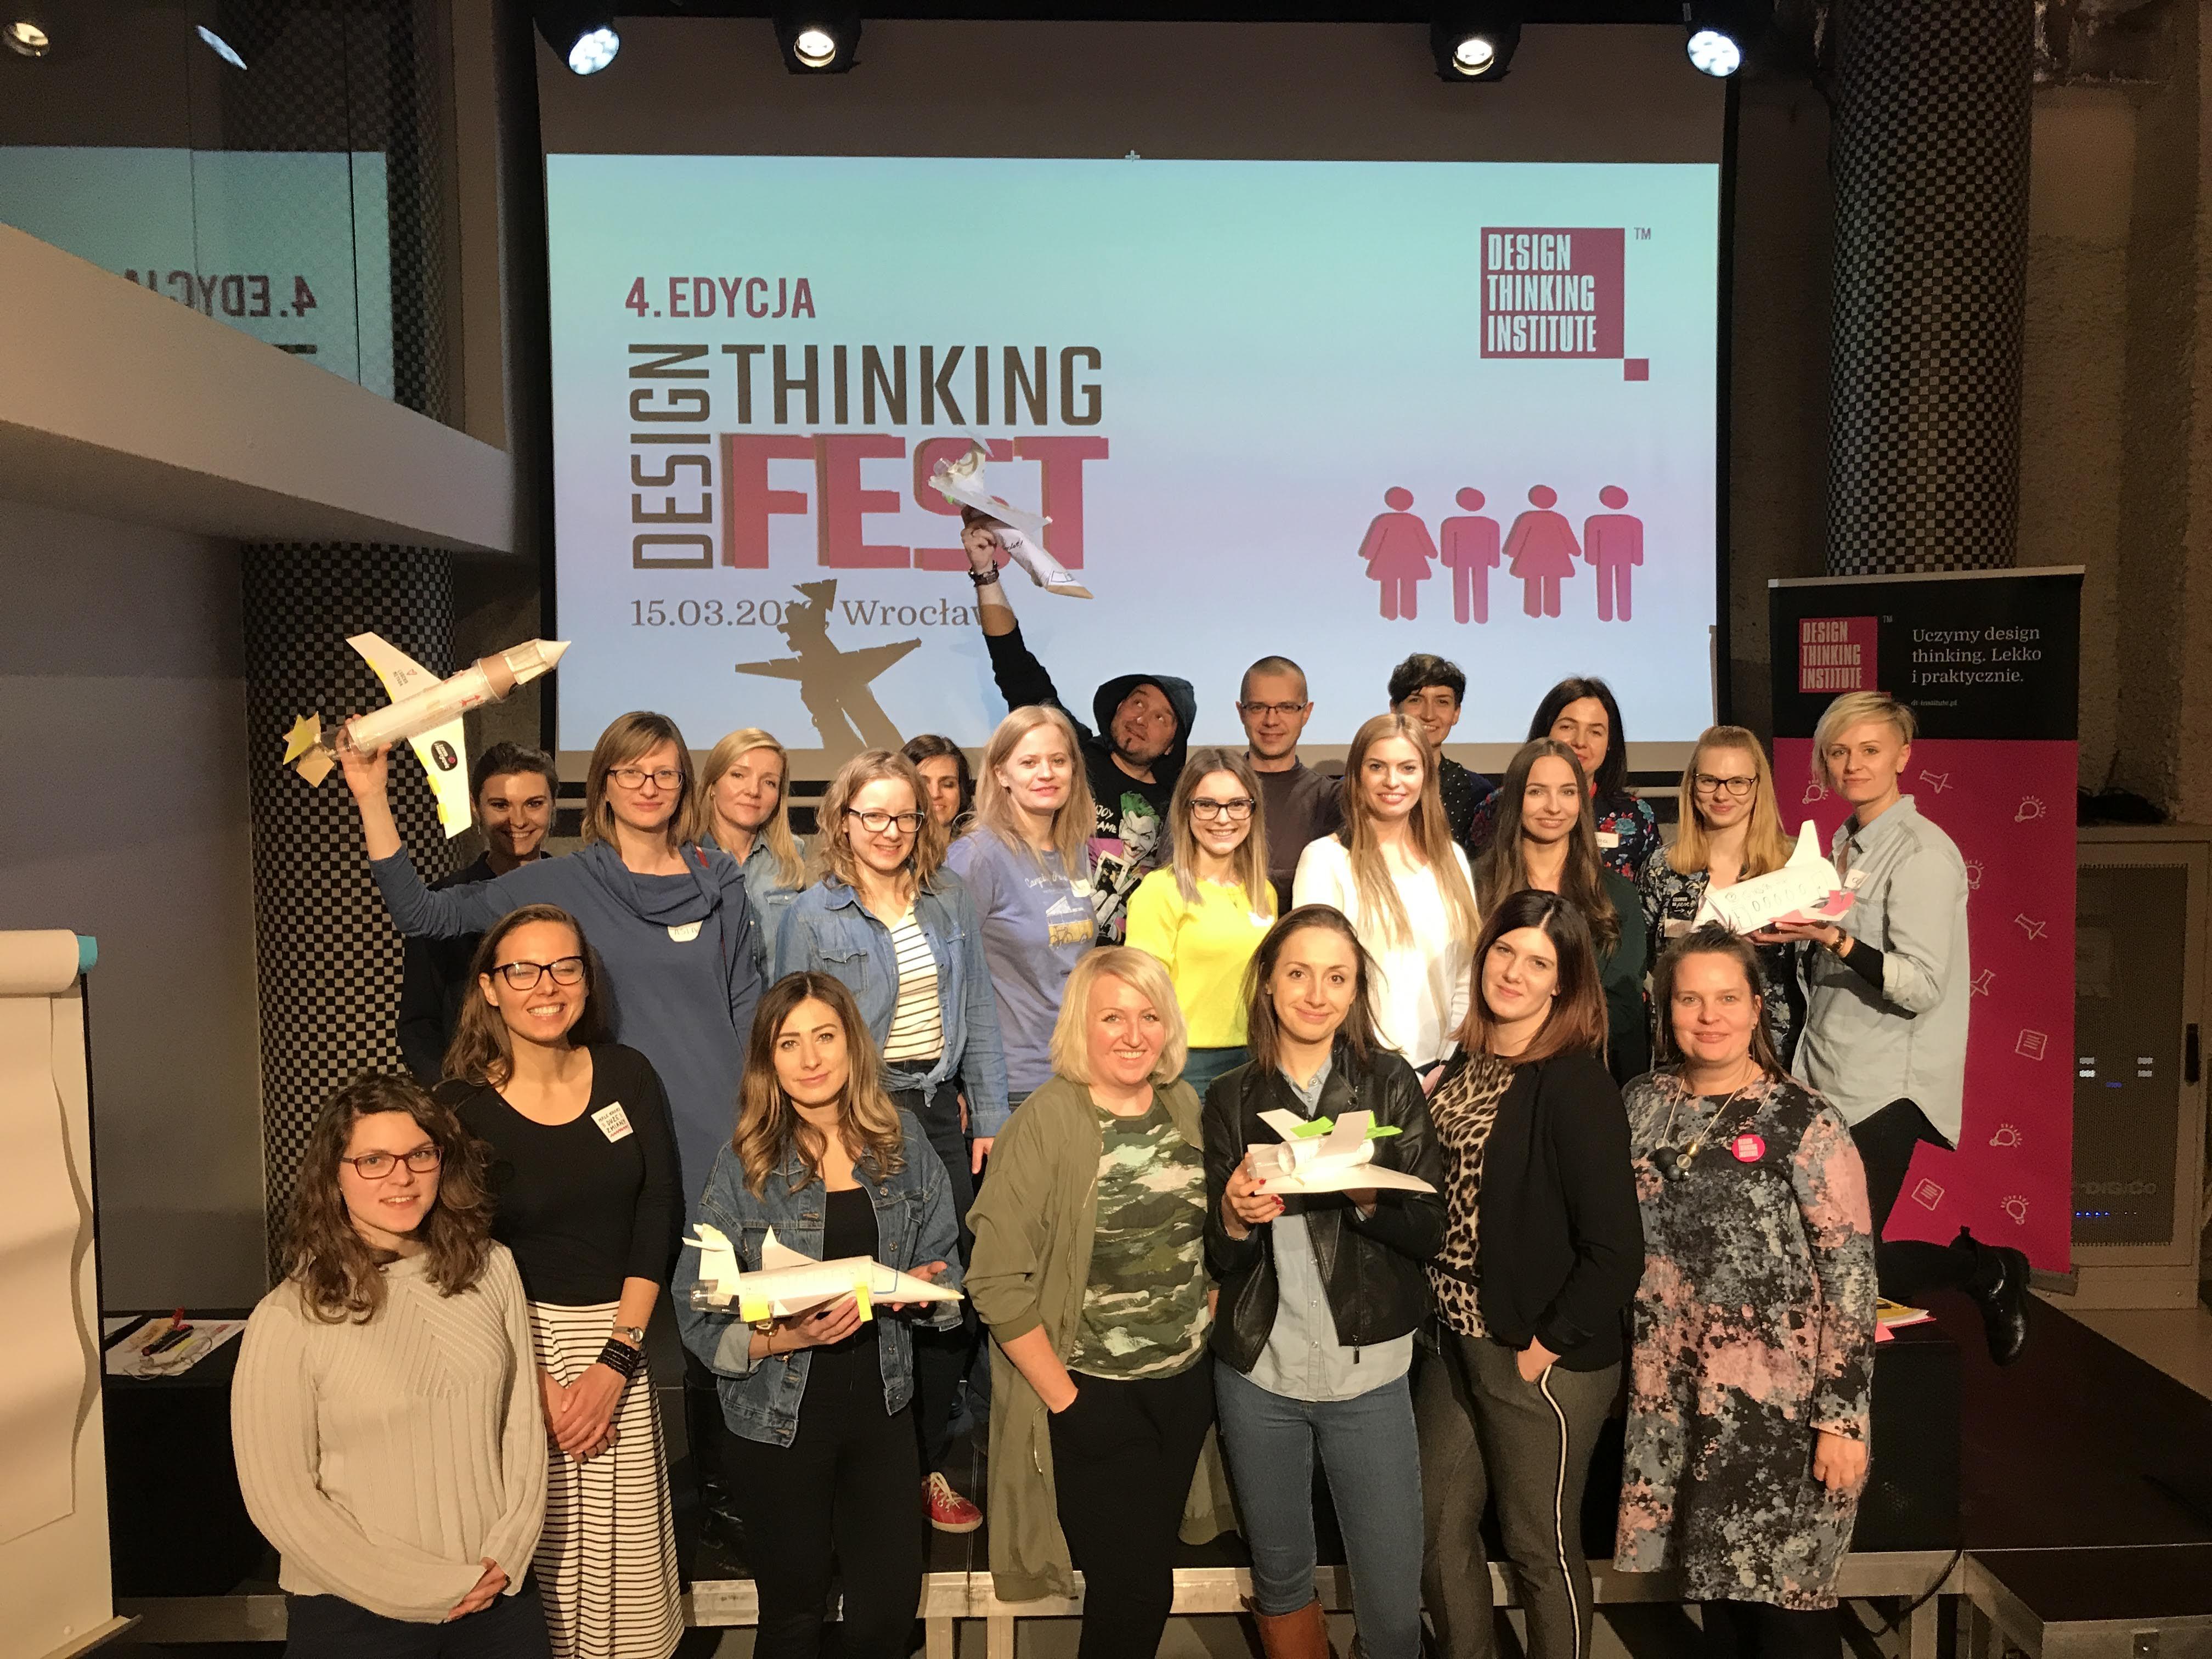 https://designthinkingfest.pl/wp-content/uploads/2019/03/IMG_6083.jpg